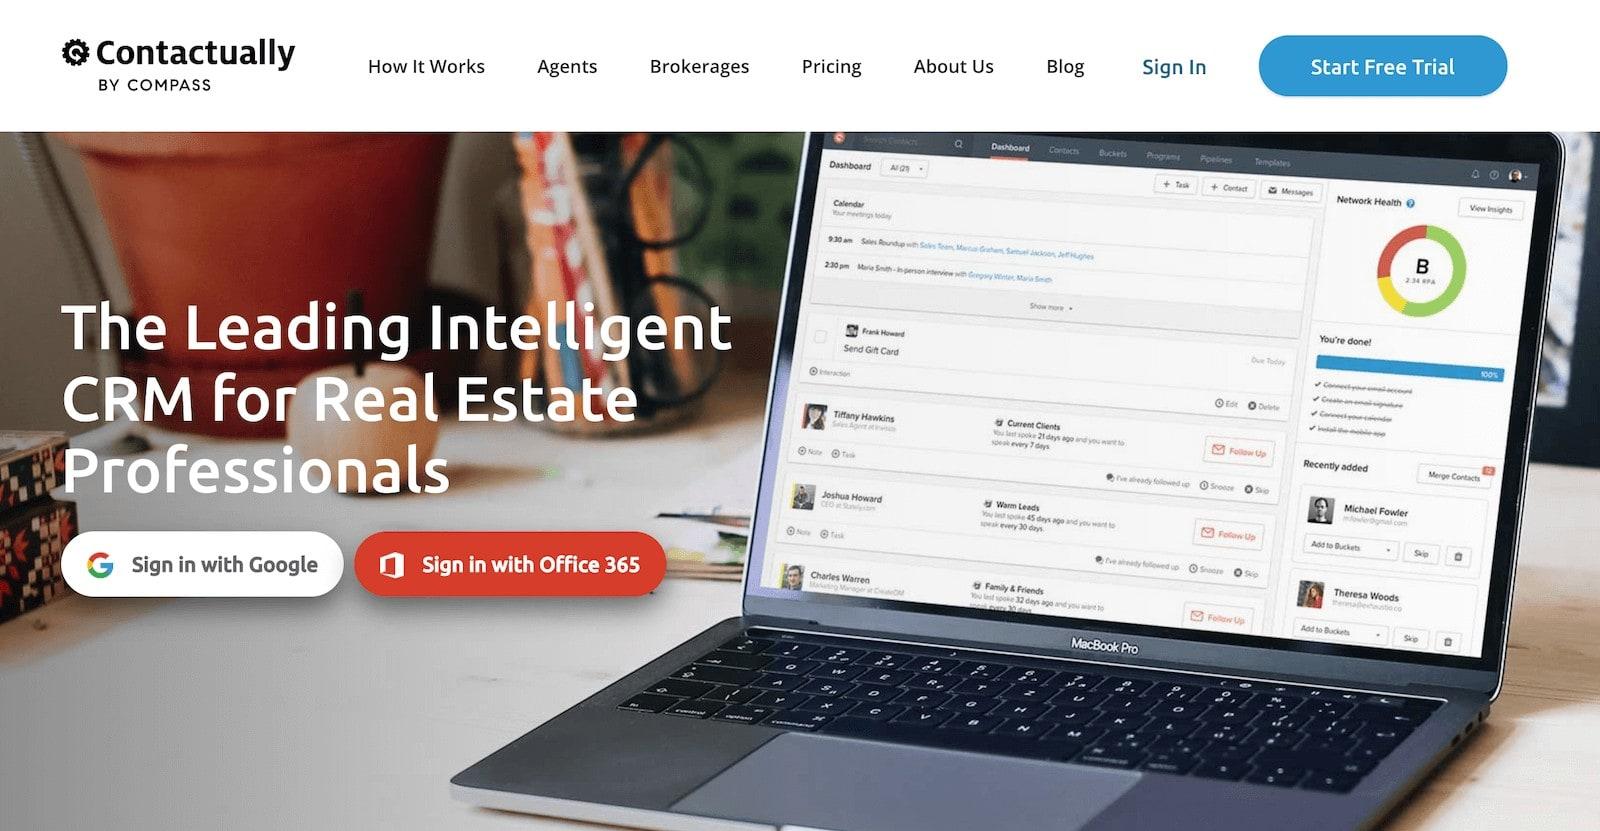 contactually app for real estate